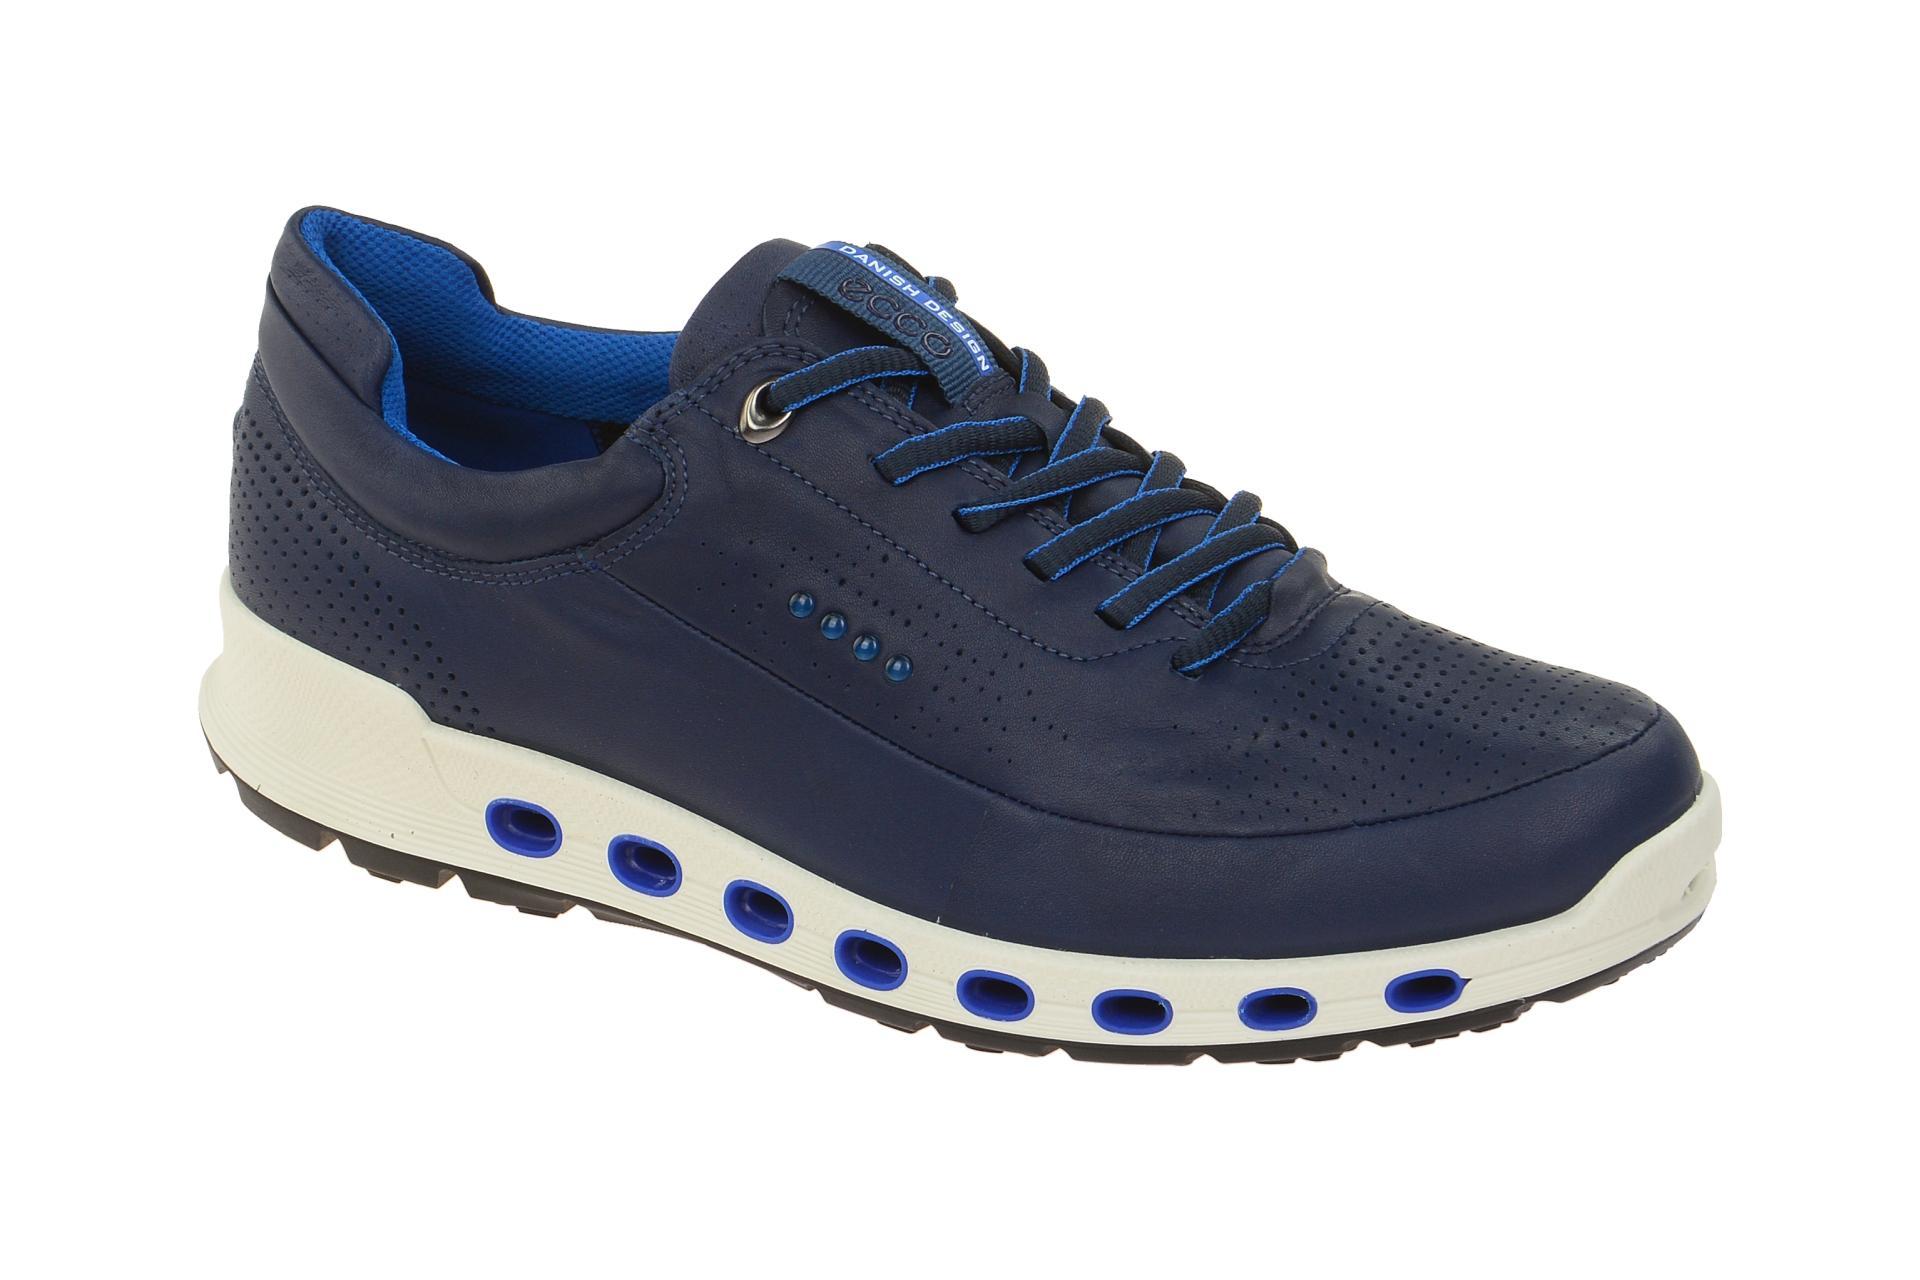 13e88bfdc56a08 ecco Cool 2 Schuhe blau Herren GORE-TEX Surround - Schuhhaus Strauch Shop